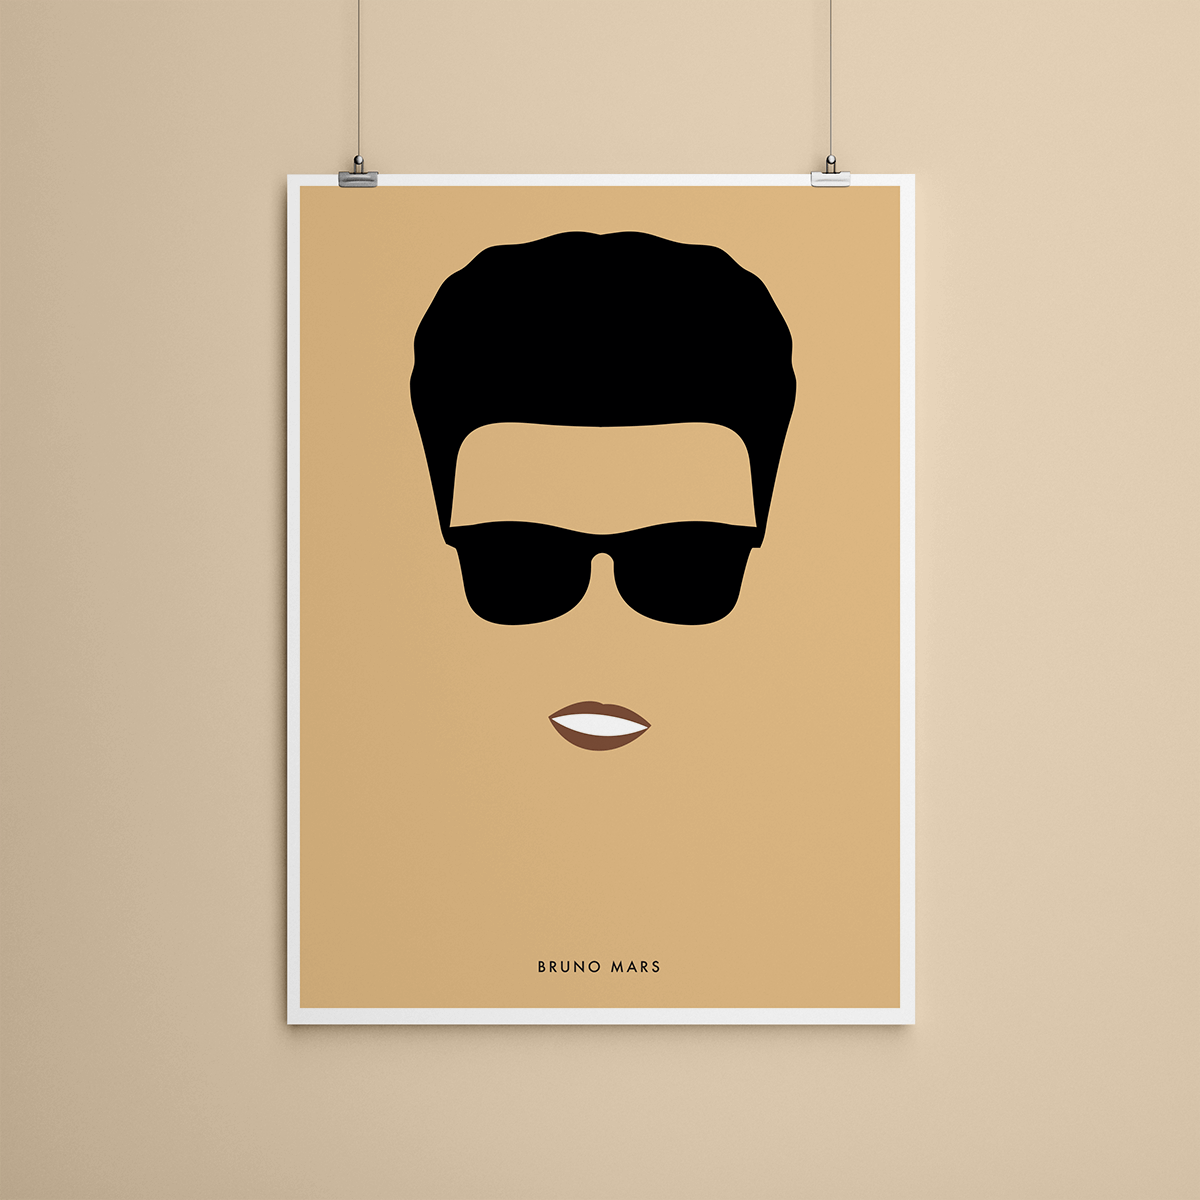 Bruno Mars - Poster minimaliste